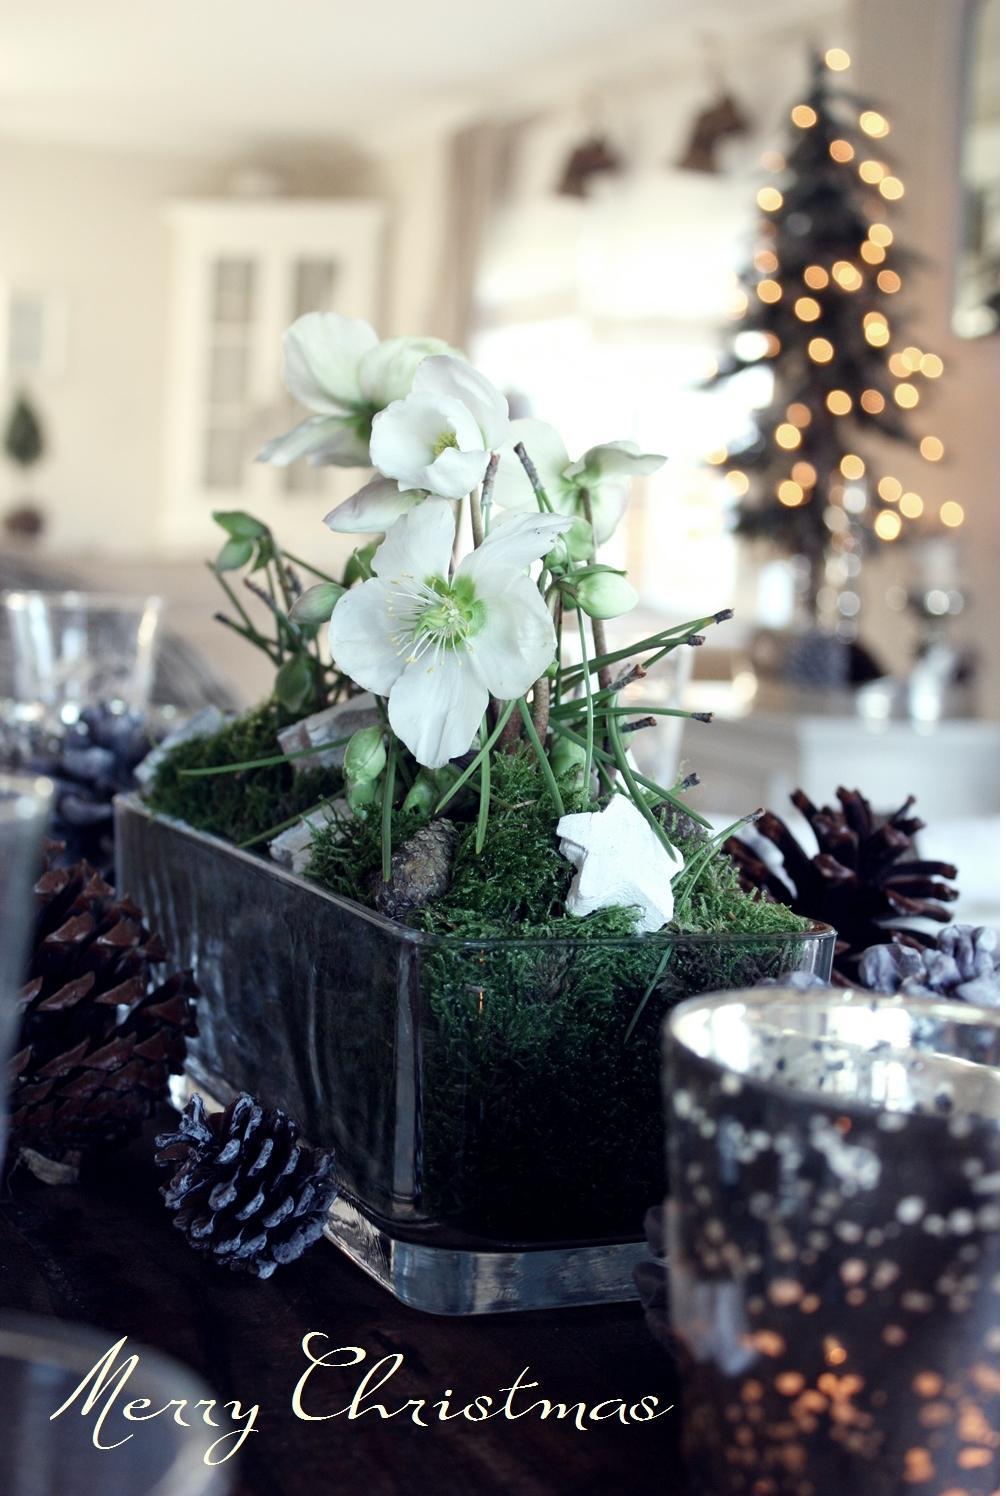 white living frohe weihnachten. Black Bedroom Furniture Sets. Home Design Ideas